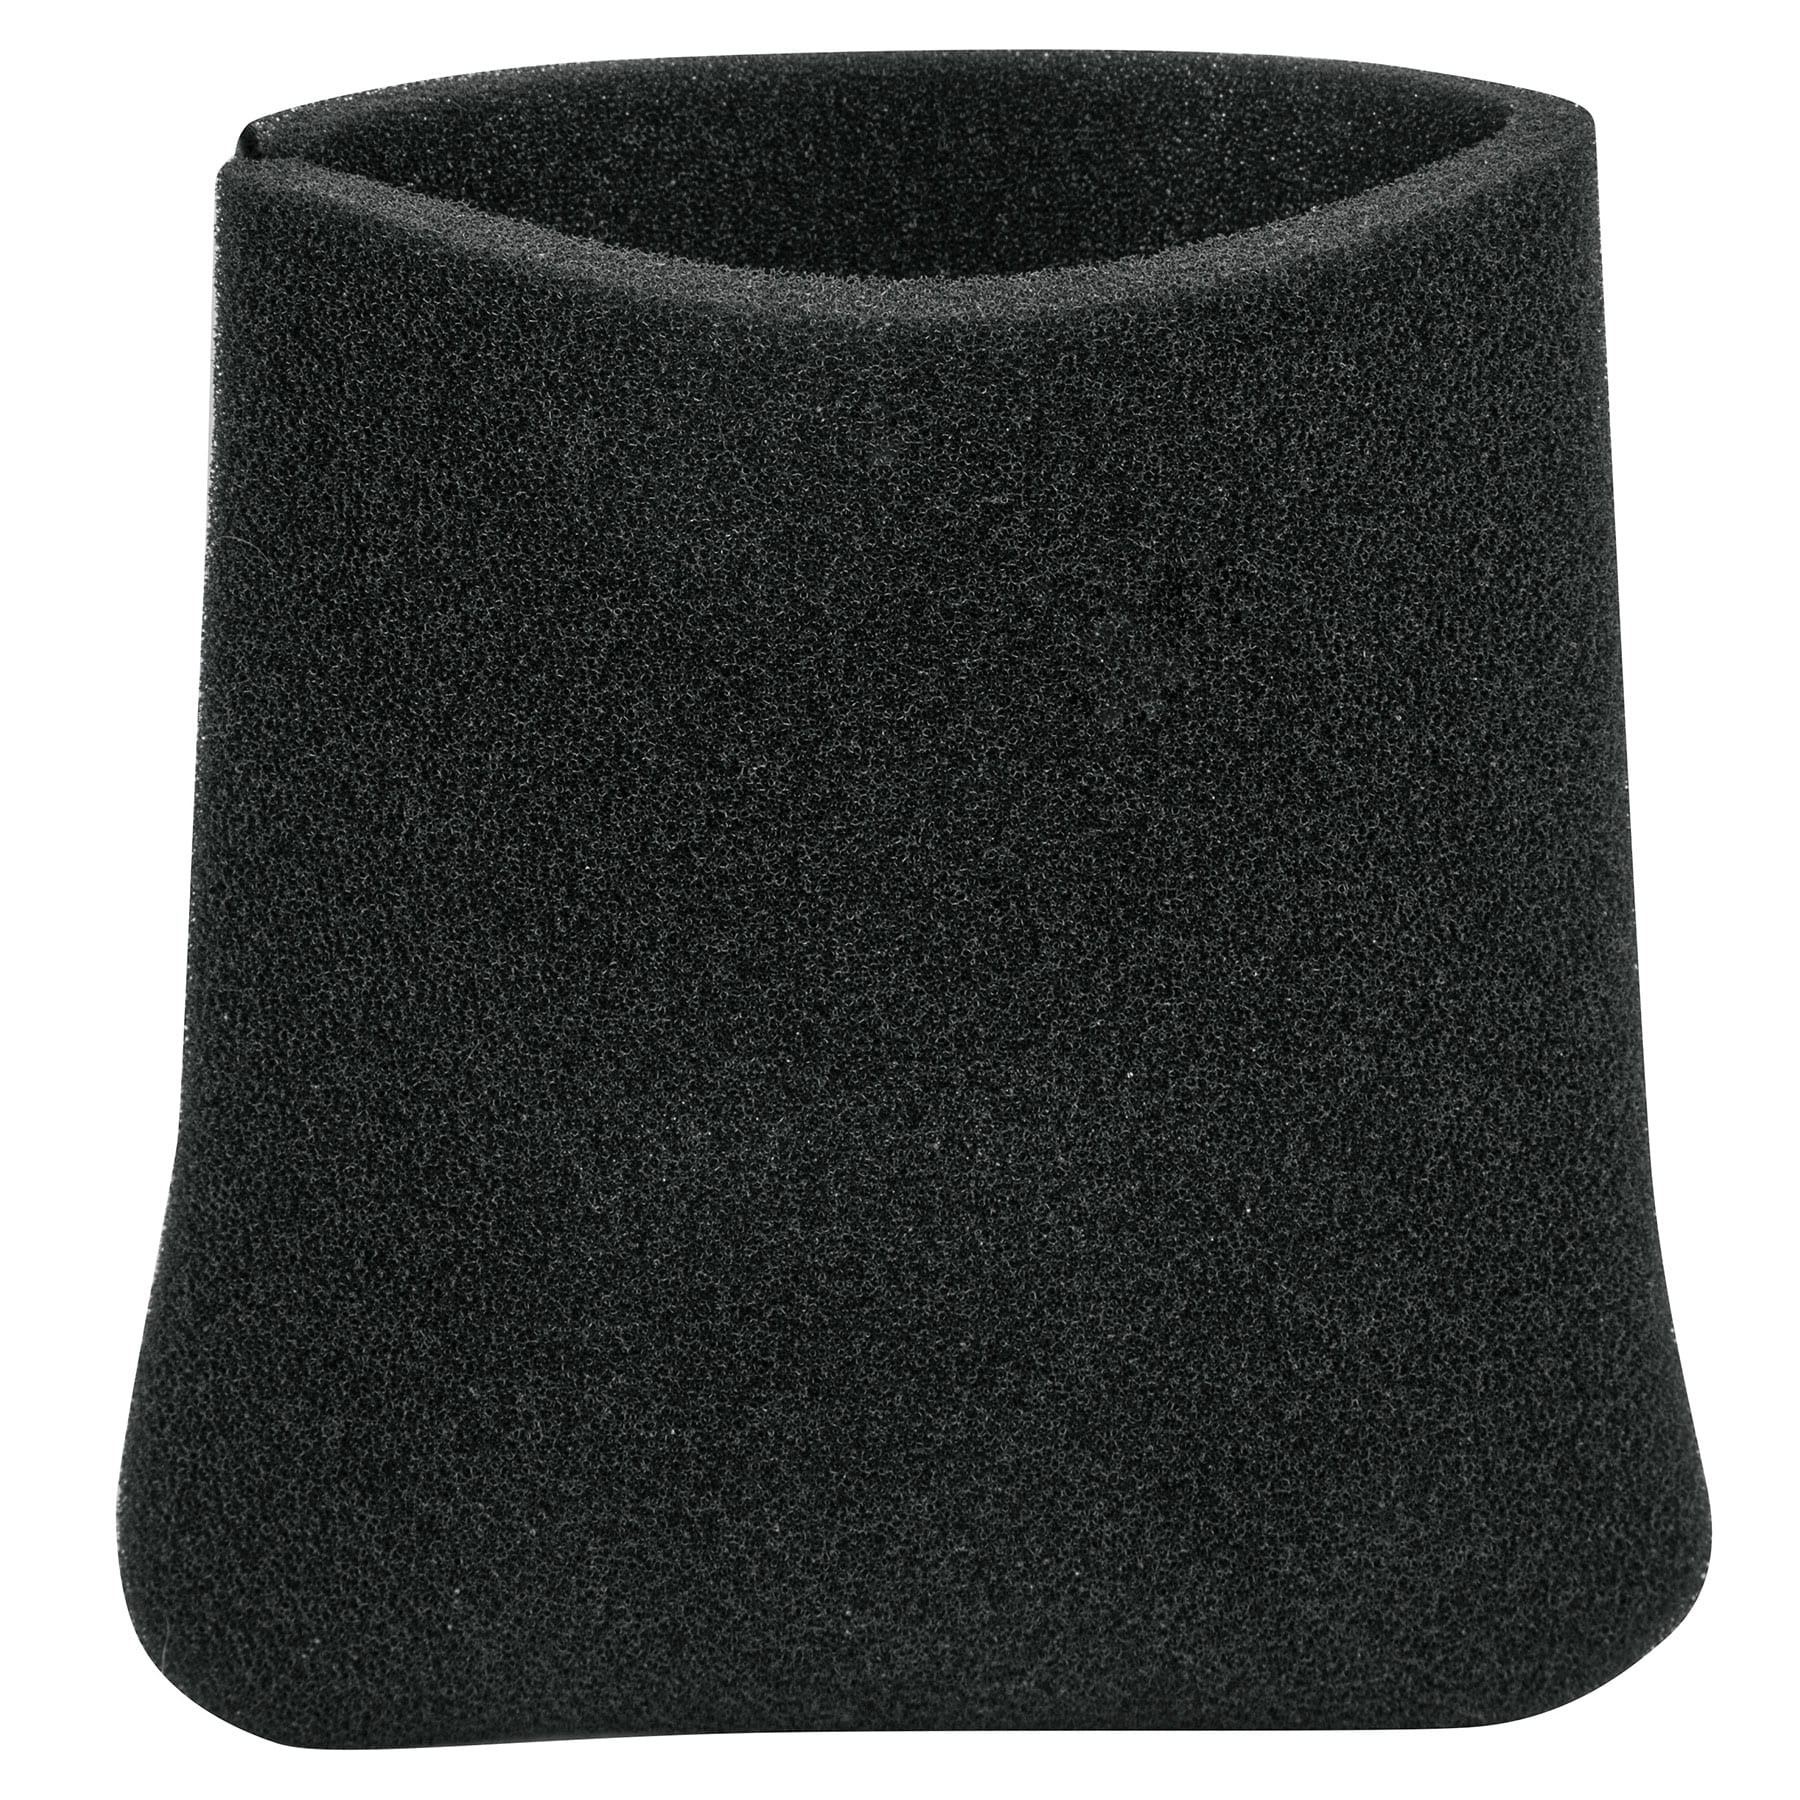 Filtro de esponja para aspiradora ASPI-08X y ASPI-16X